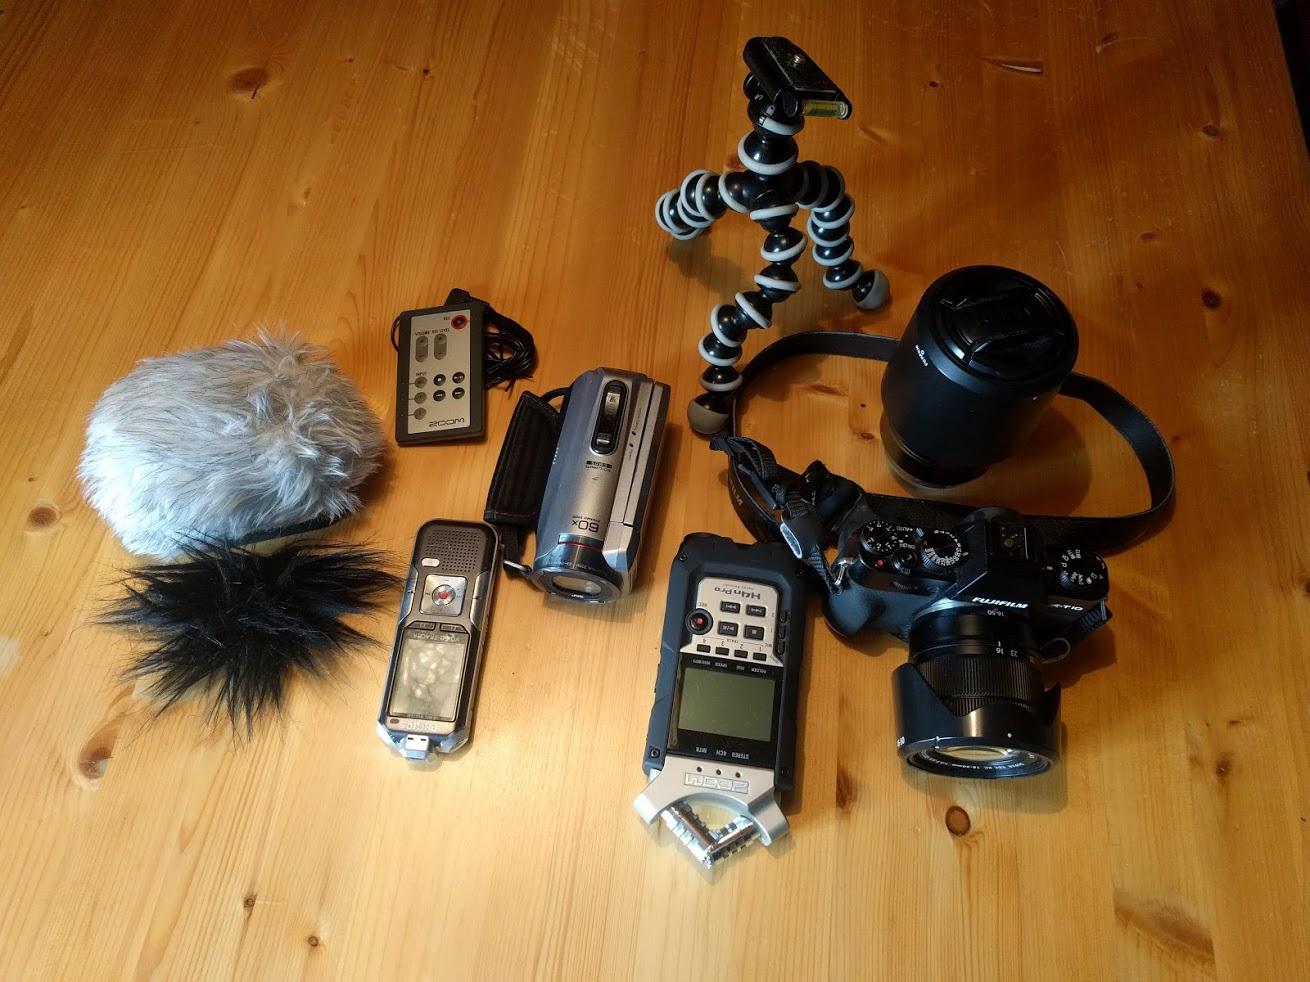 Kamera-Regorder-Inside-Politics-Ausrüstung